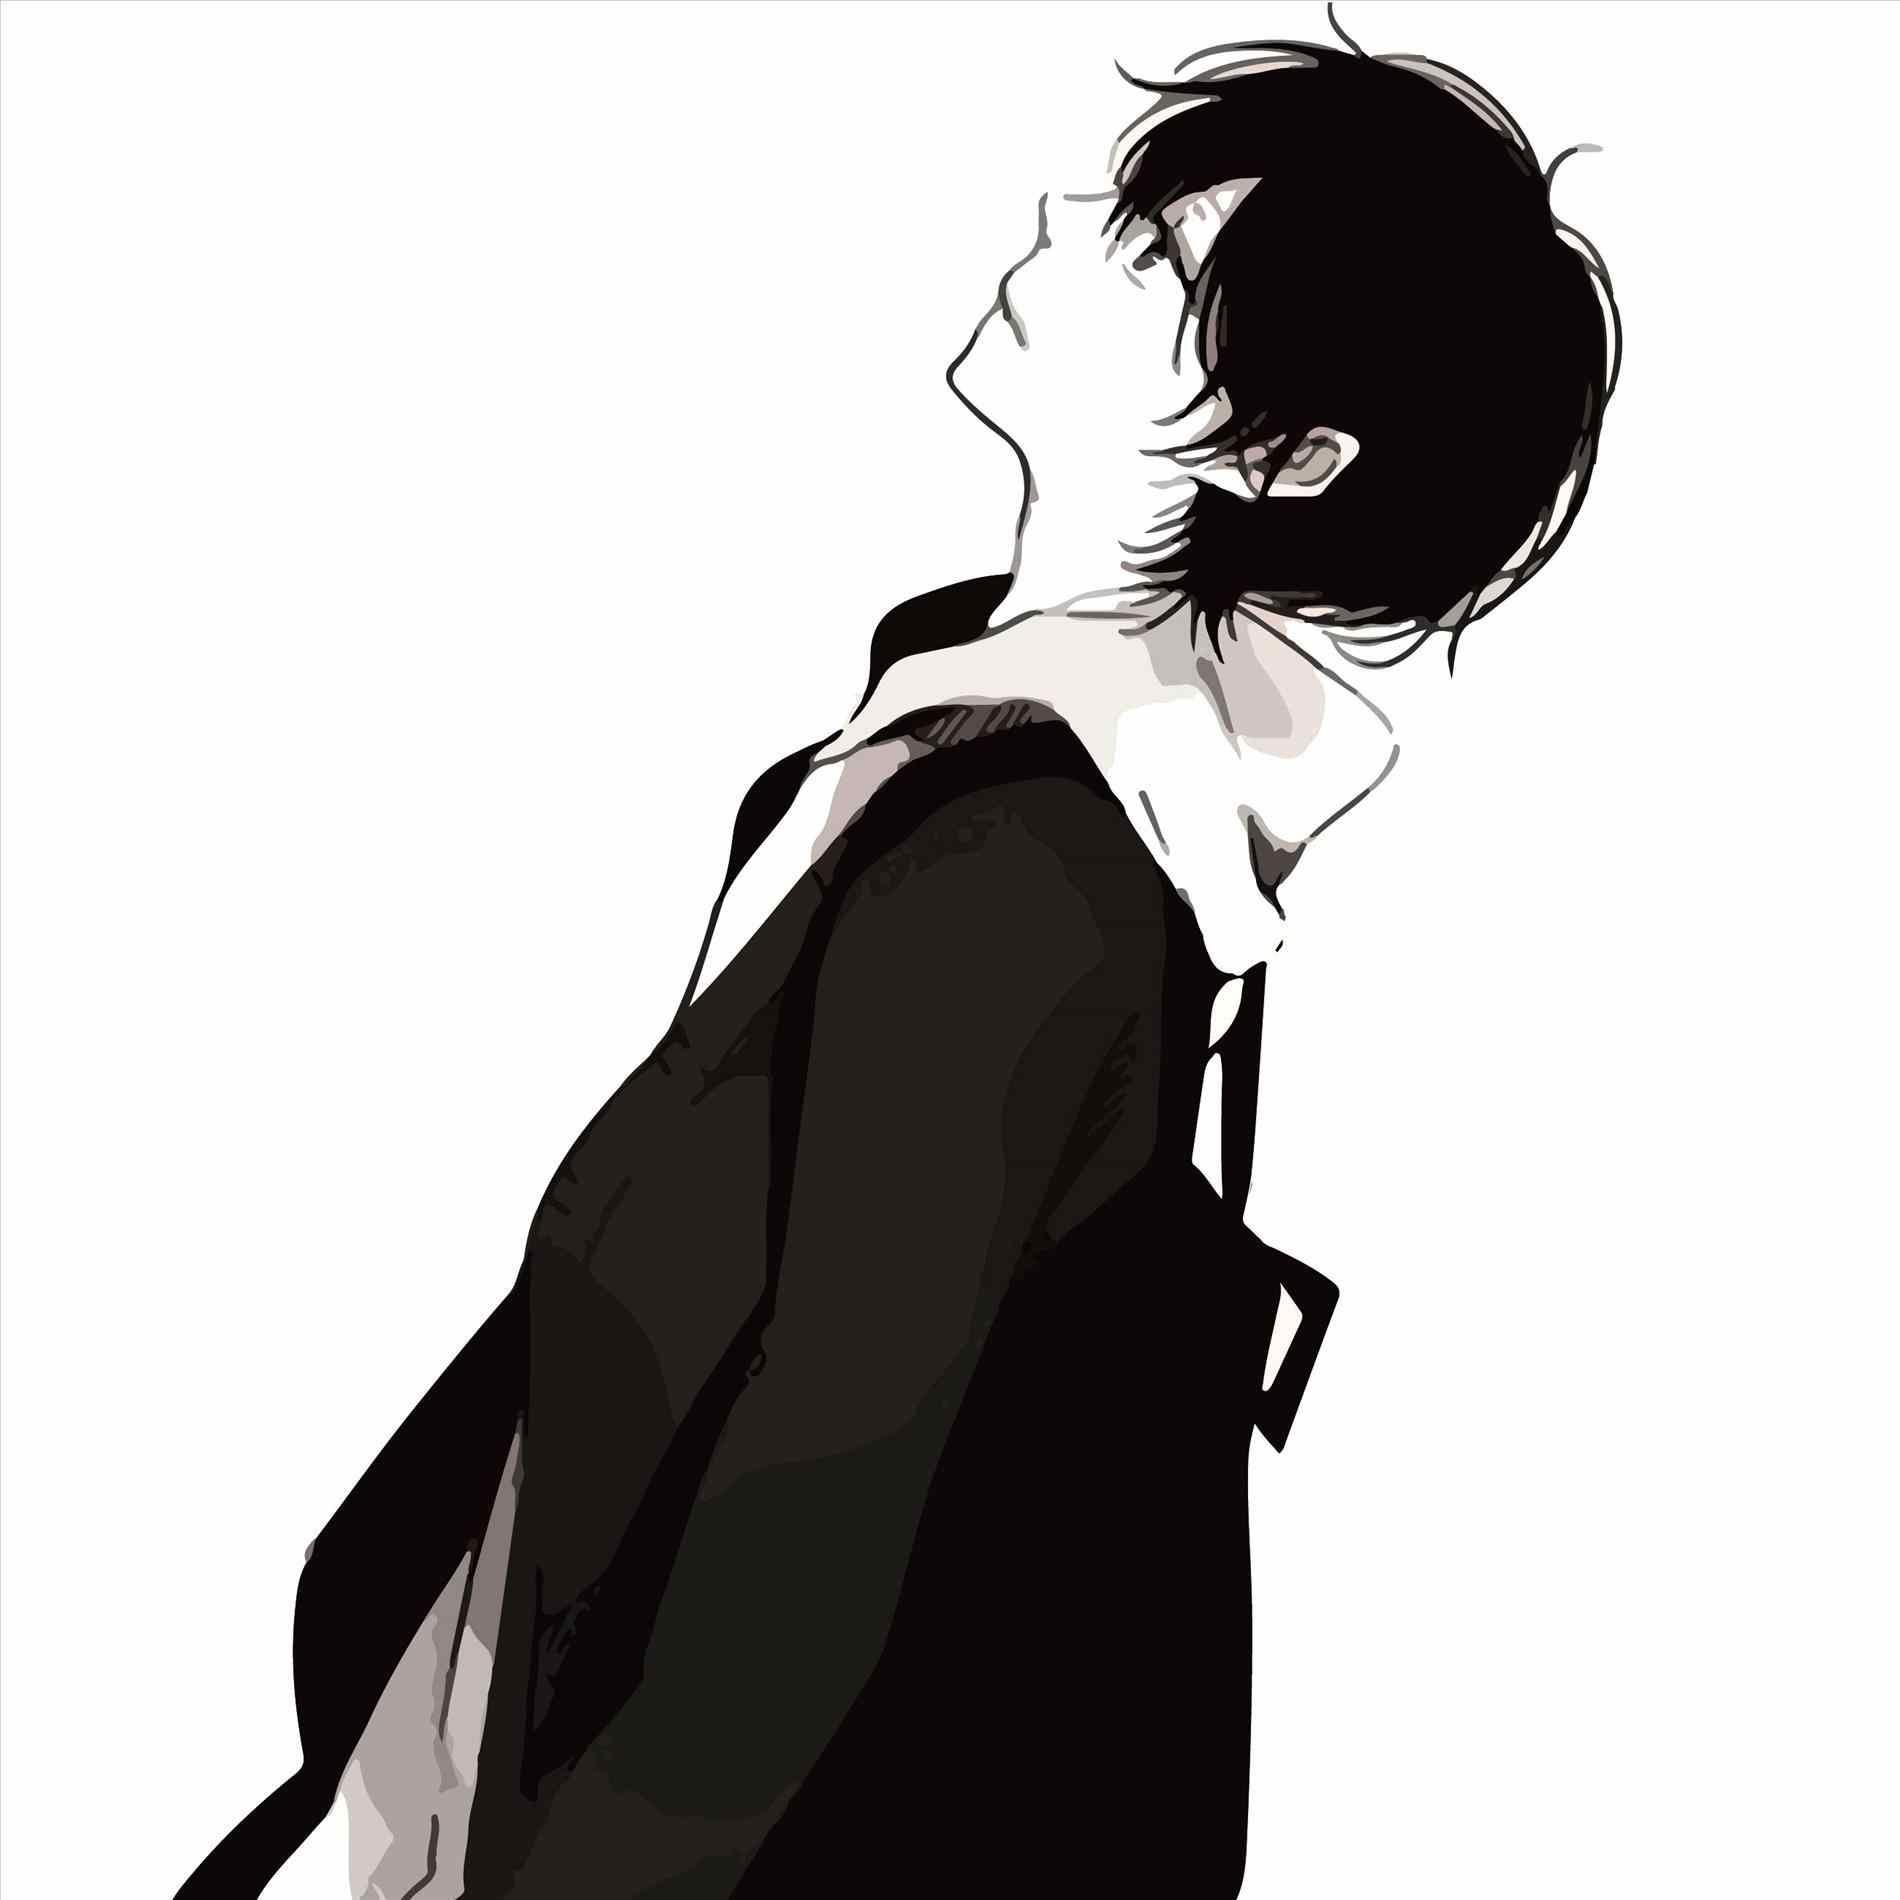 Boy anime cartoon sad face drawing images girl hd wallpaper girl